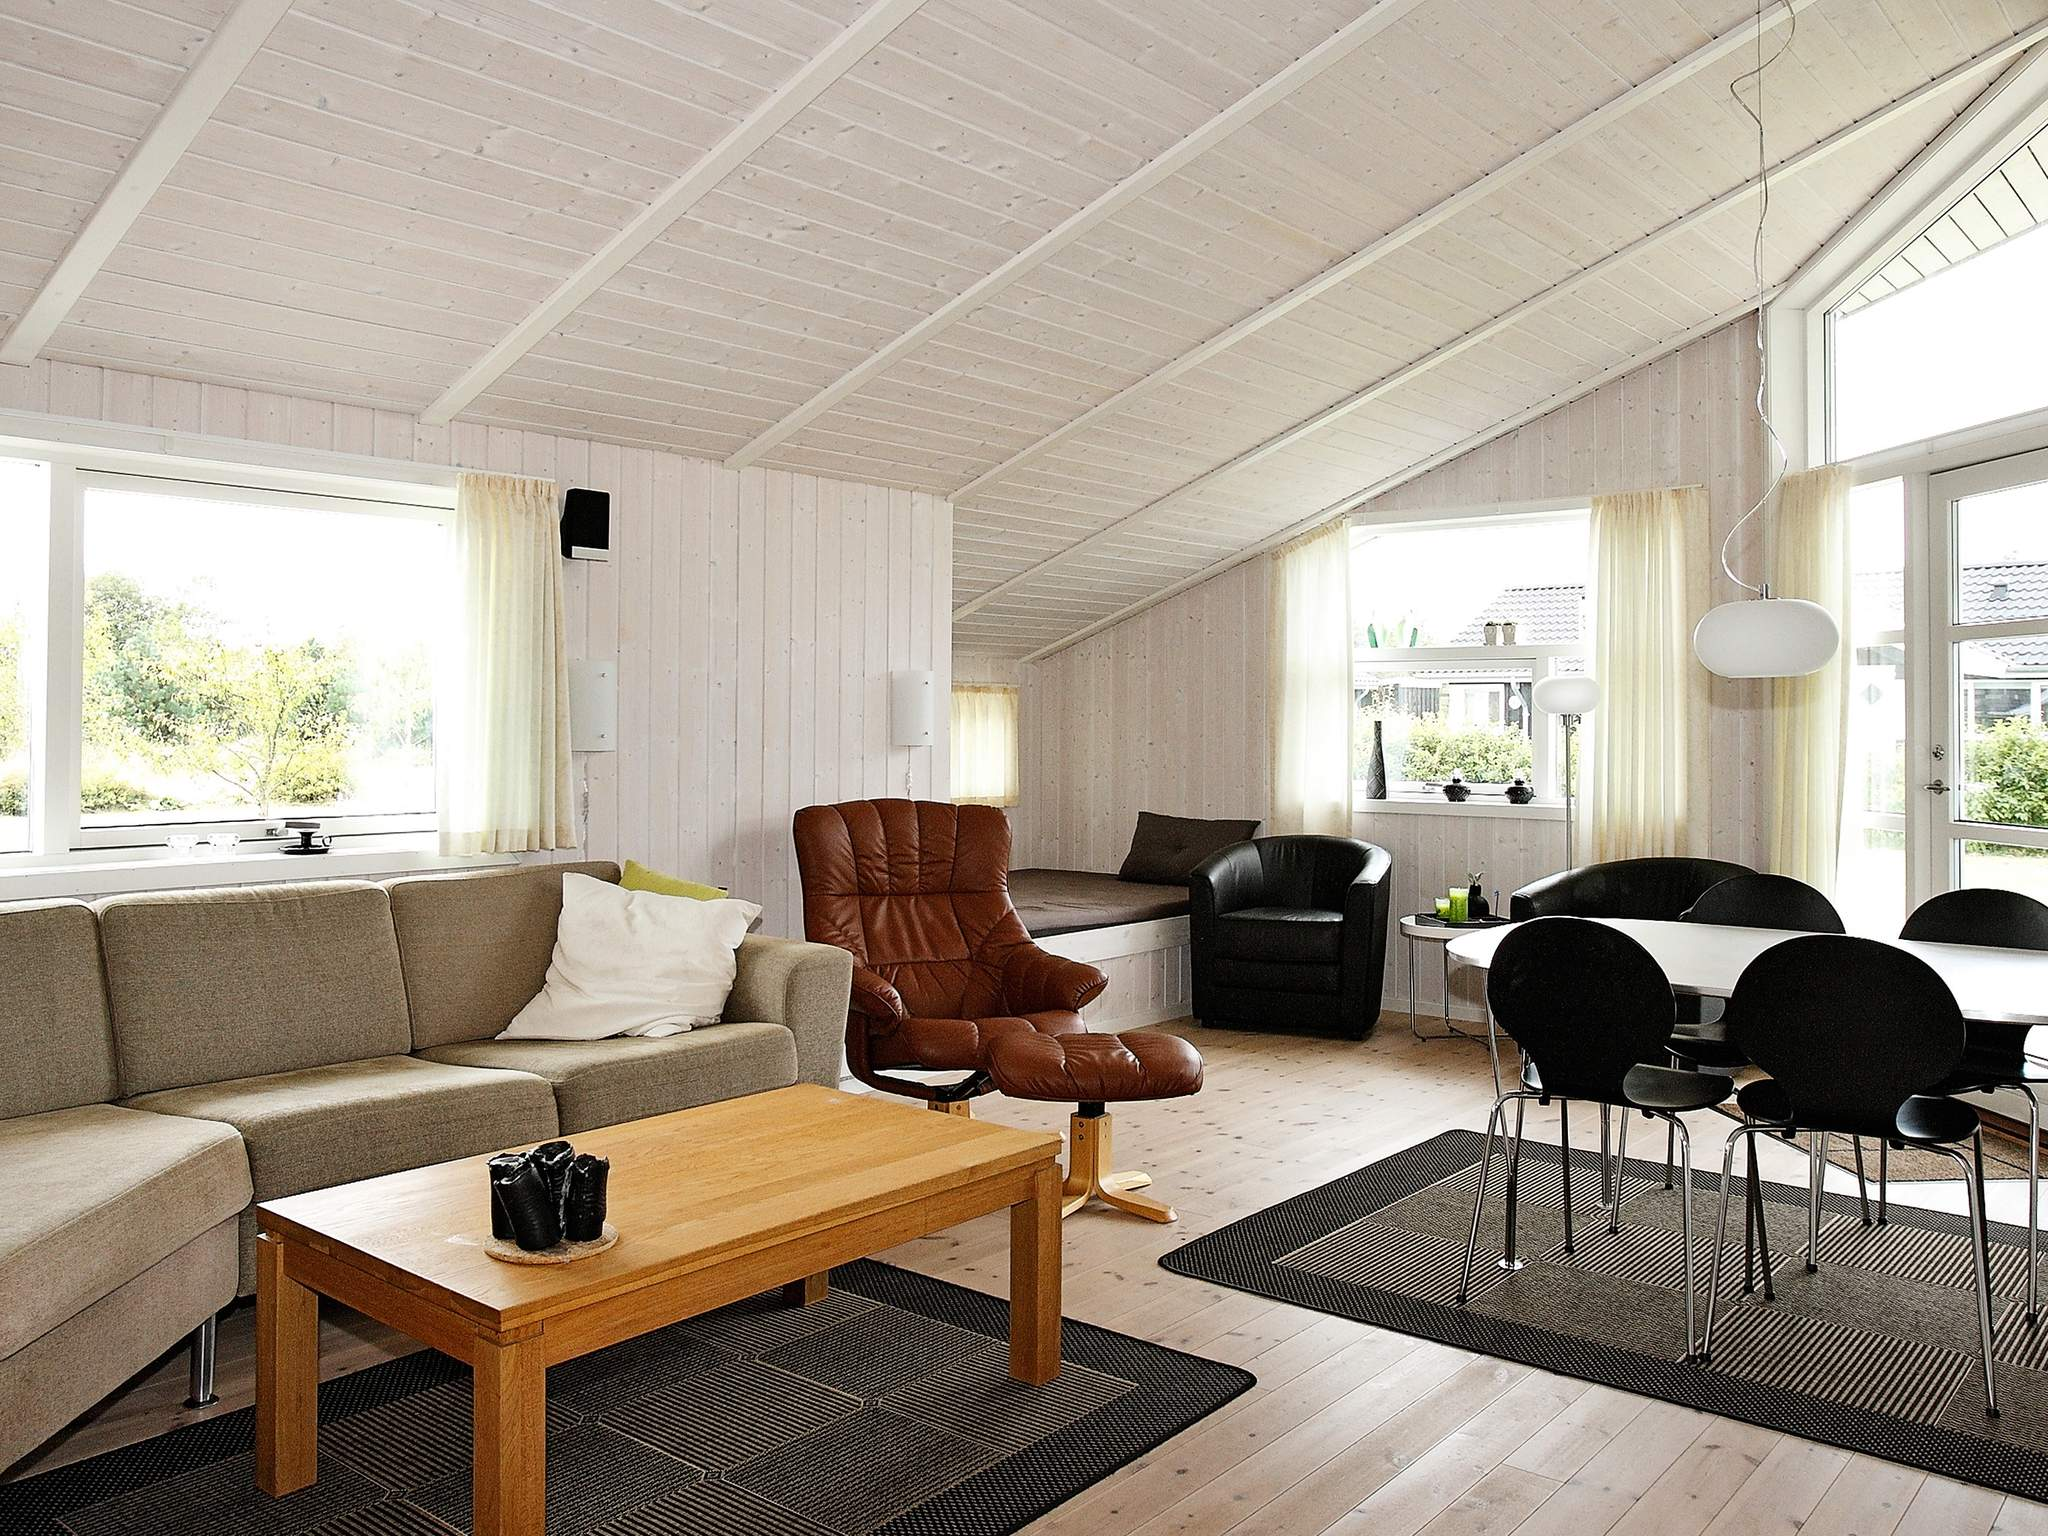 Ferienhaus Øster Hurup (1079907), Øster Hurup, , Ostjütland, Dänemark, Bild 6